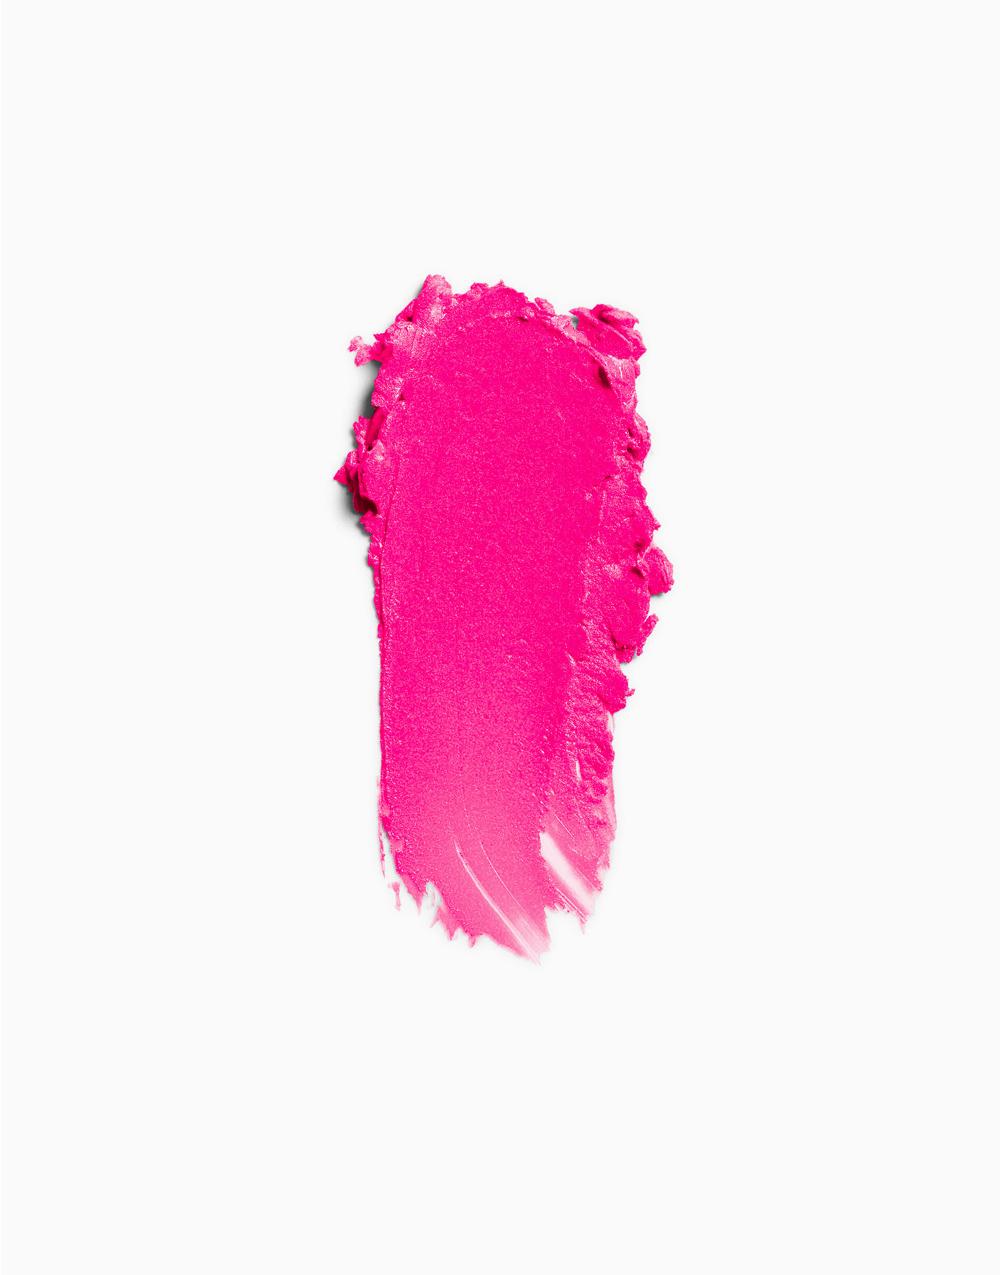 Exhibitionist Cream Lipstick by CoverGirl   Enchantress Blush